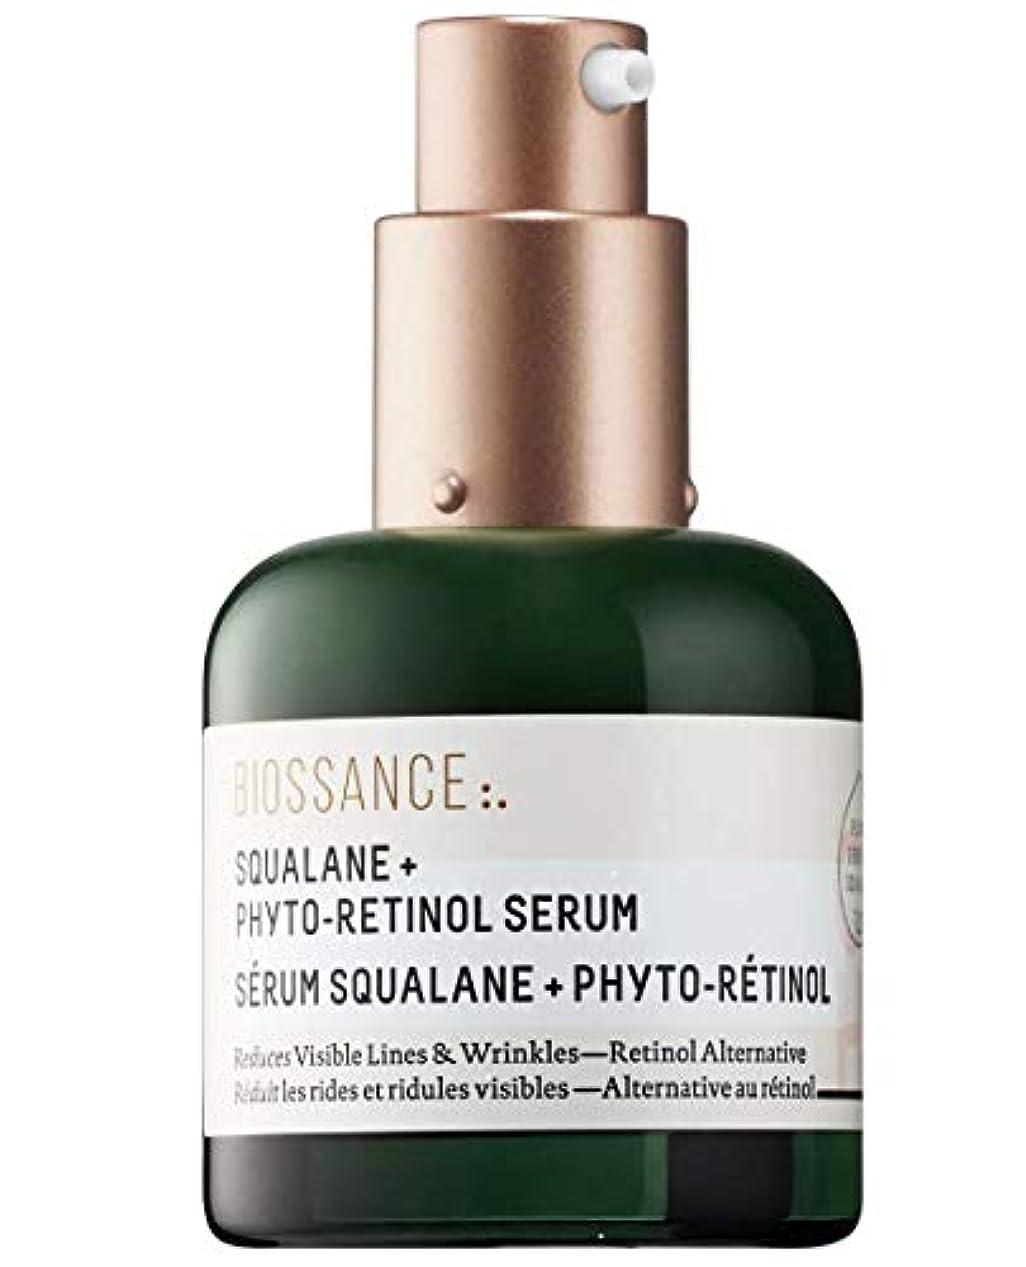 倉庫藤色中断Biossance Squalane + Phyto-Retinol Serum 30ml